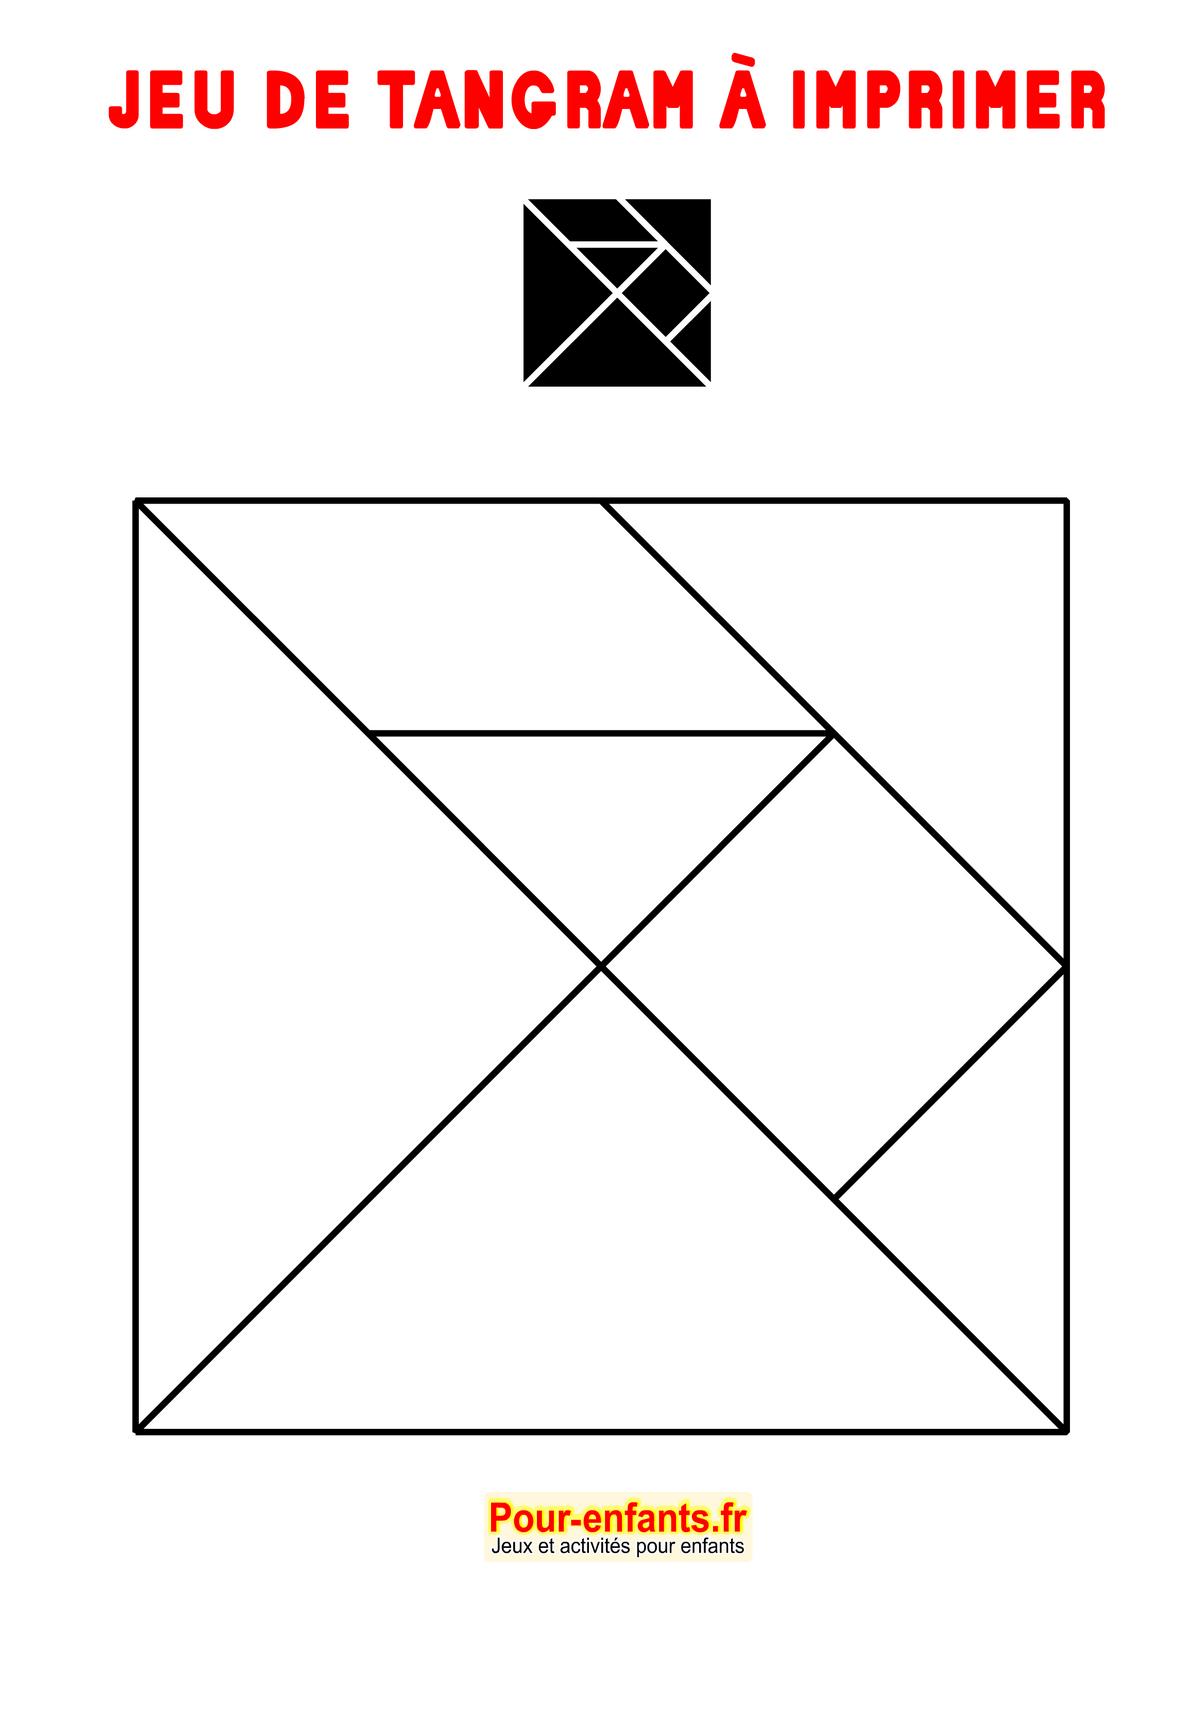 Tangram À Imprimer Maternelle Gratuit Jeux Tangrams encequiconcerne Tangram En Maternelle